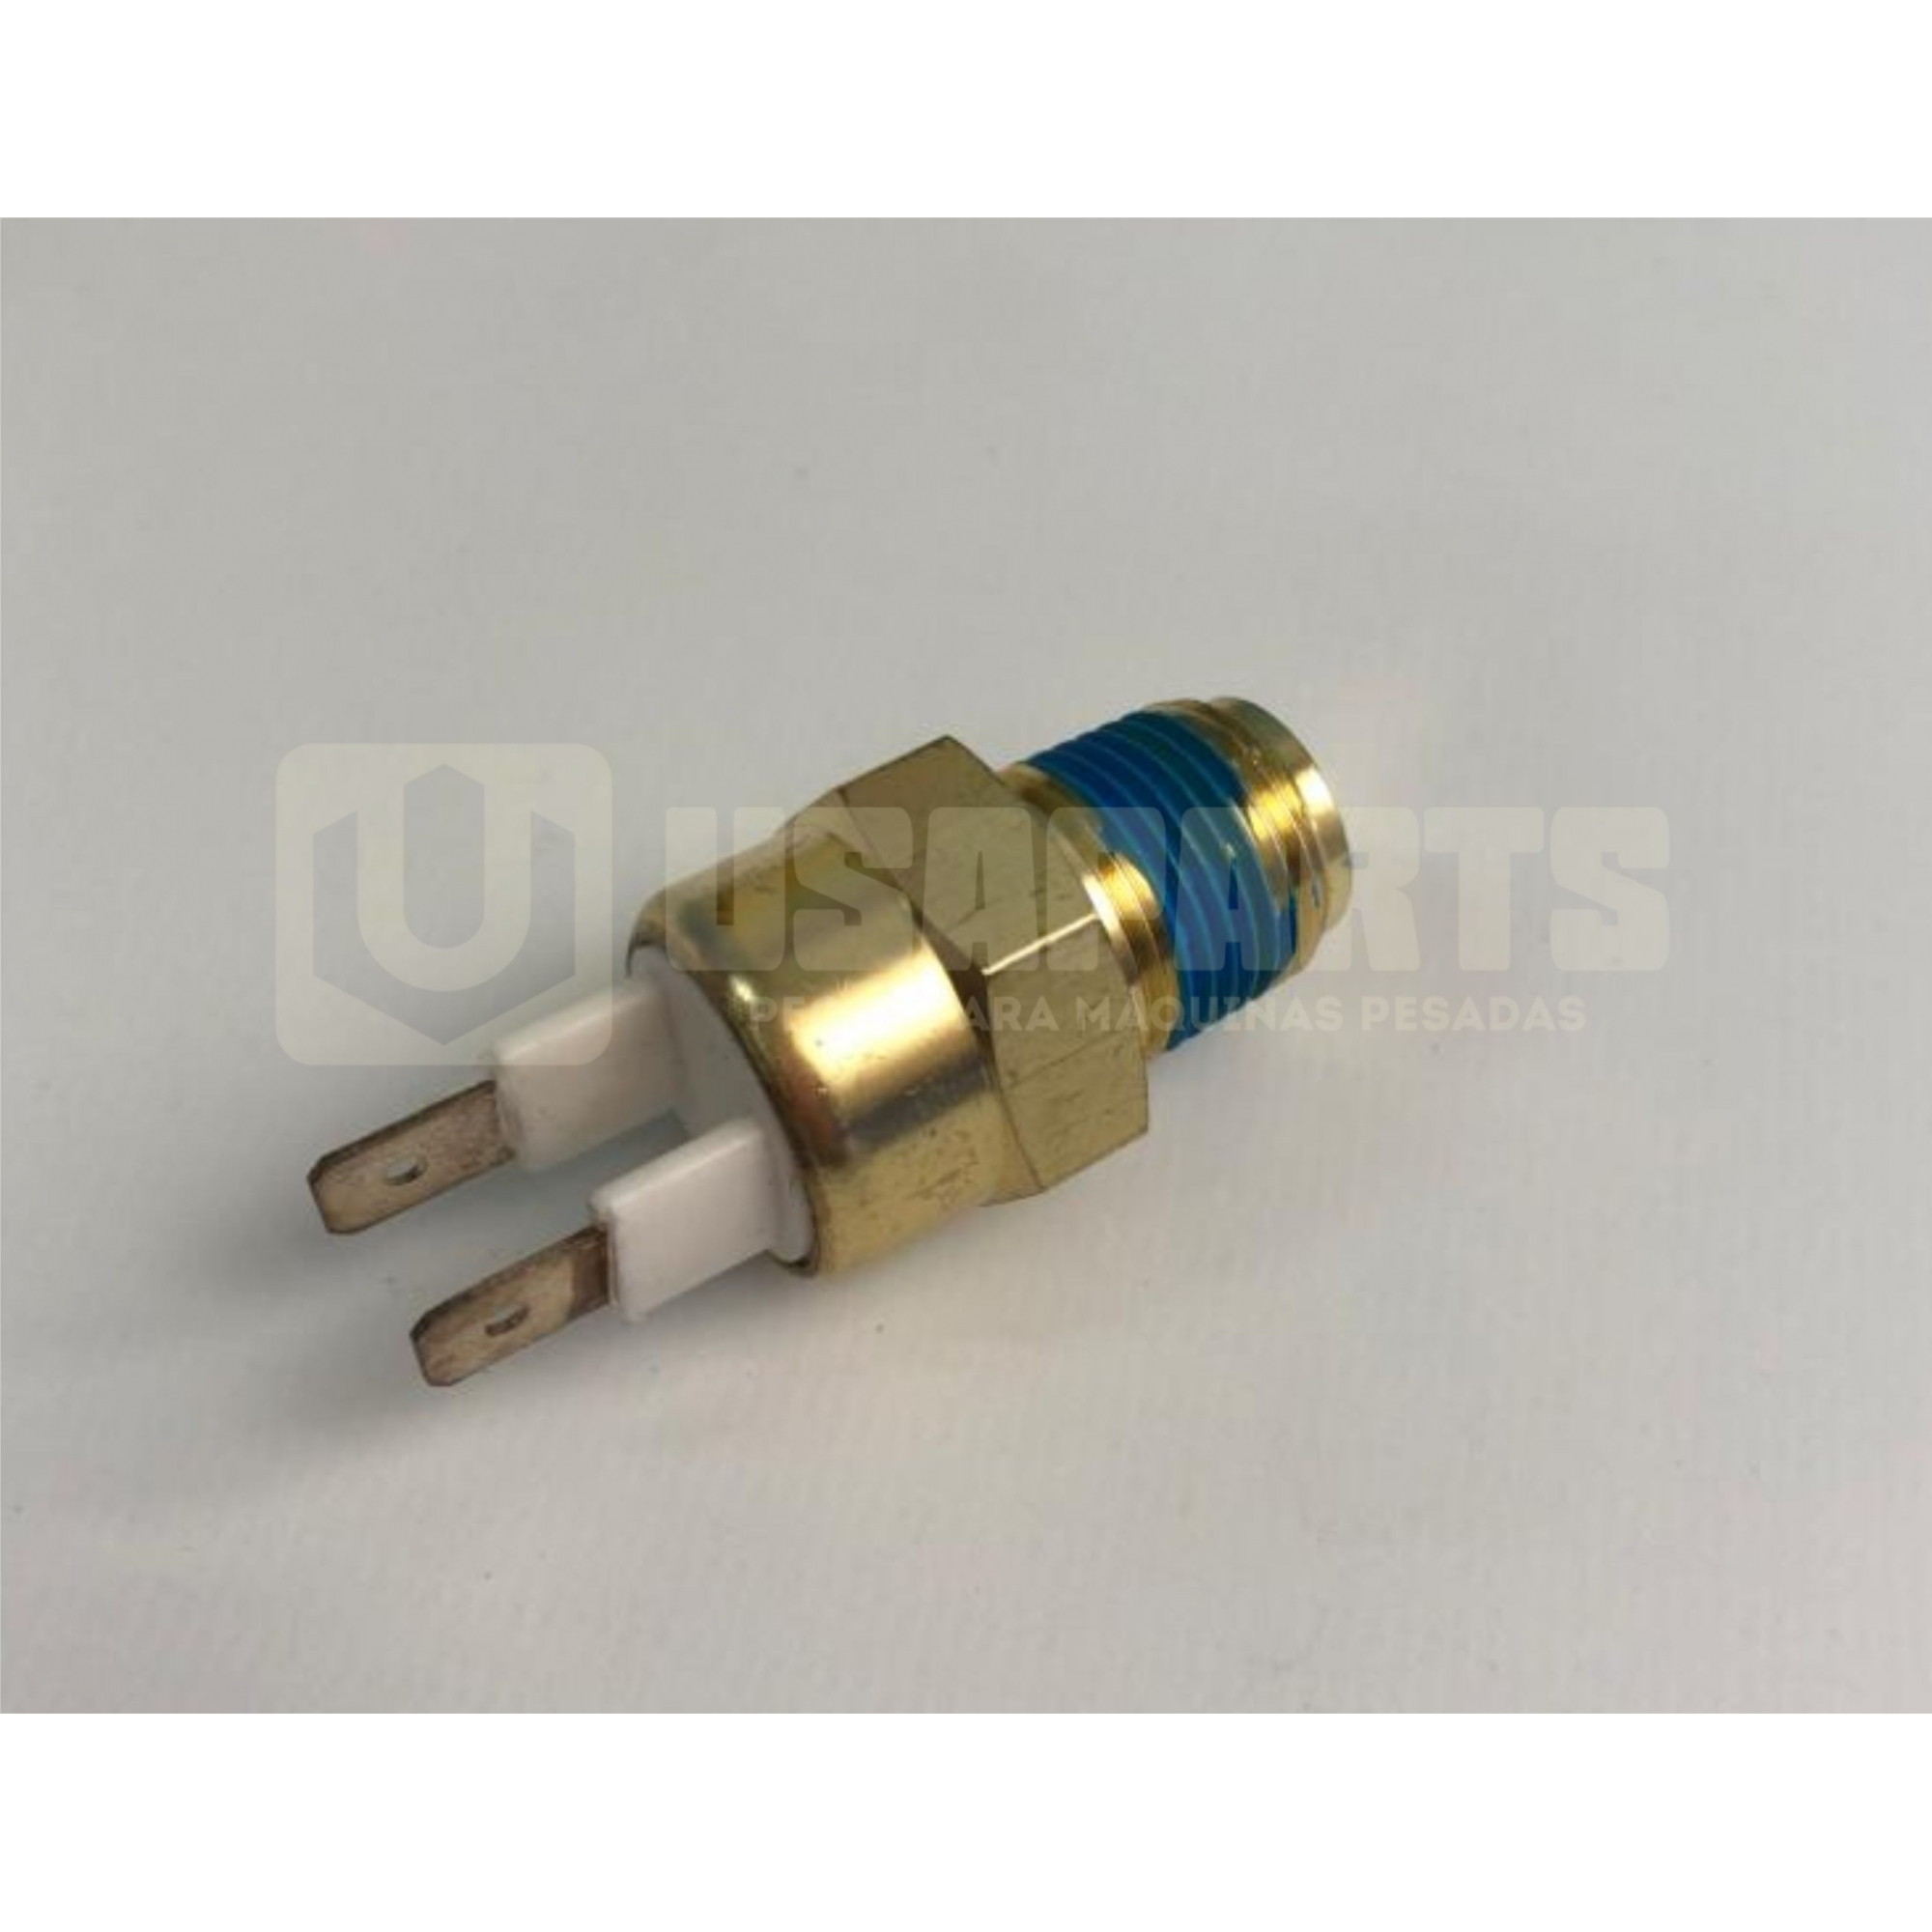 Sensor Temp. Combustível  1104C / H940C   ZUAC00095